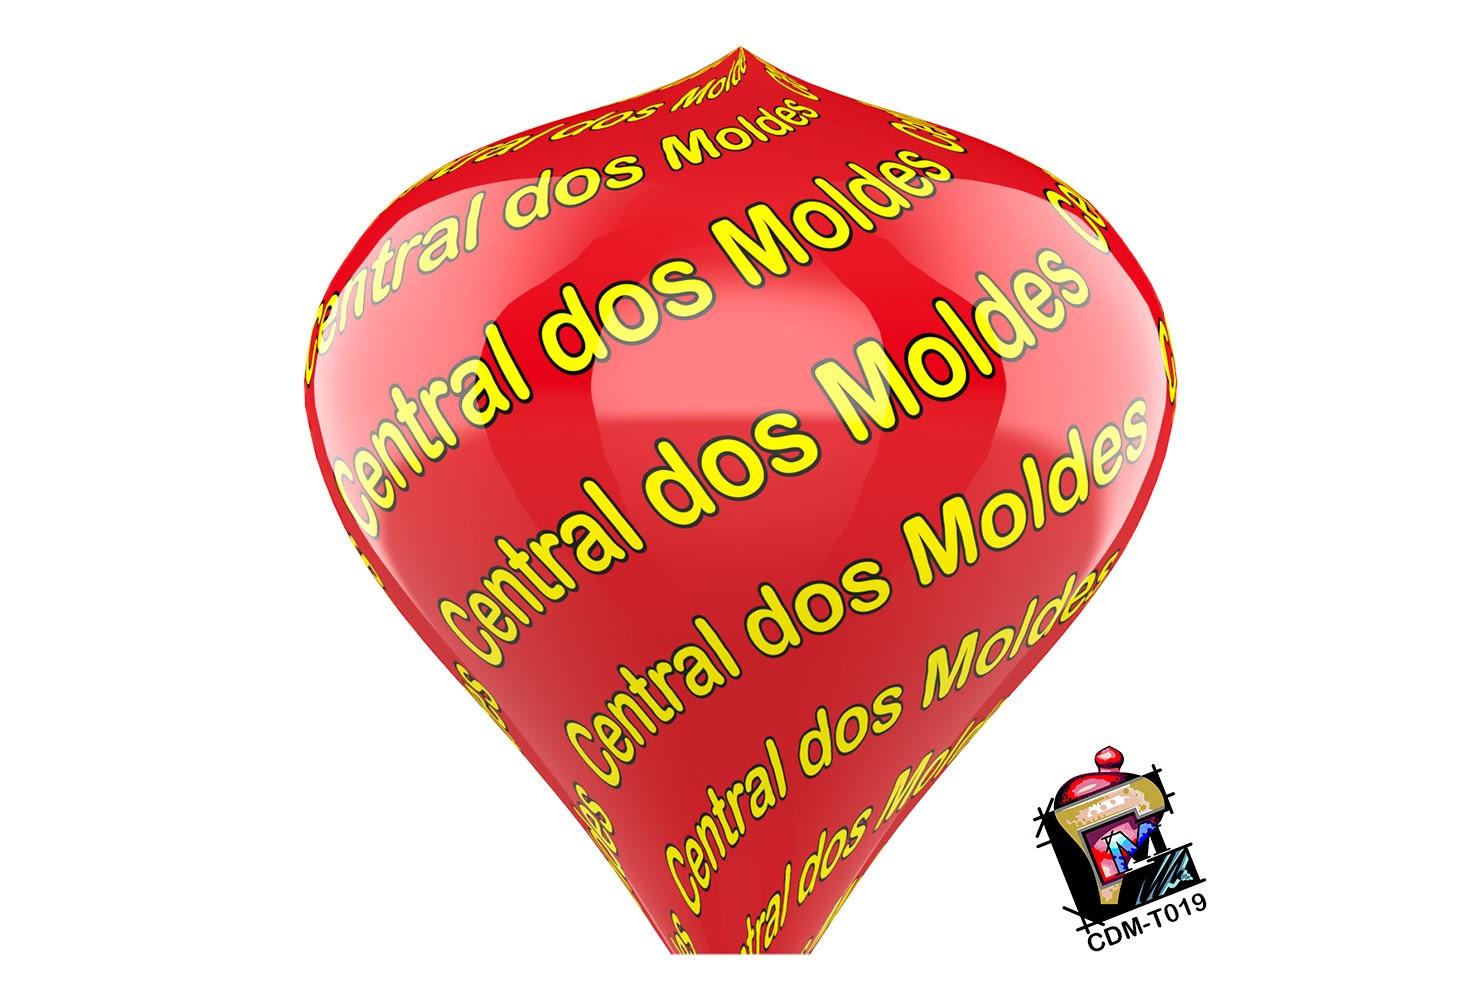 CDM-T019-01042013 - Silhueta